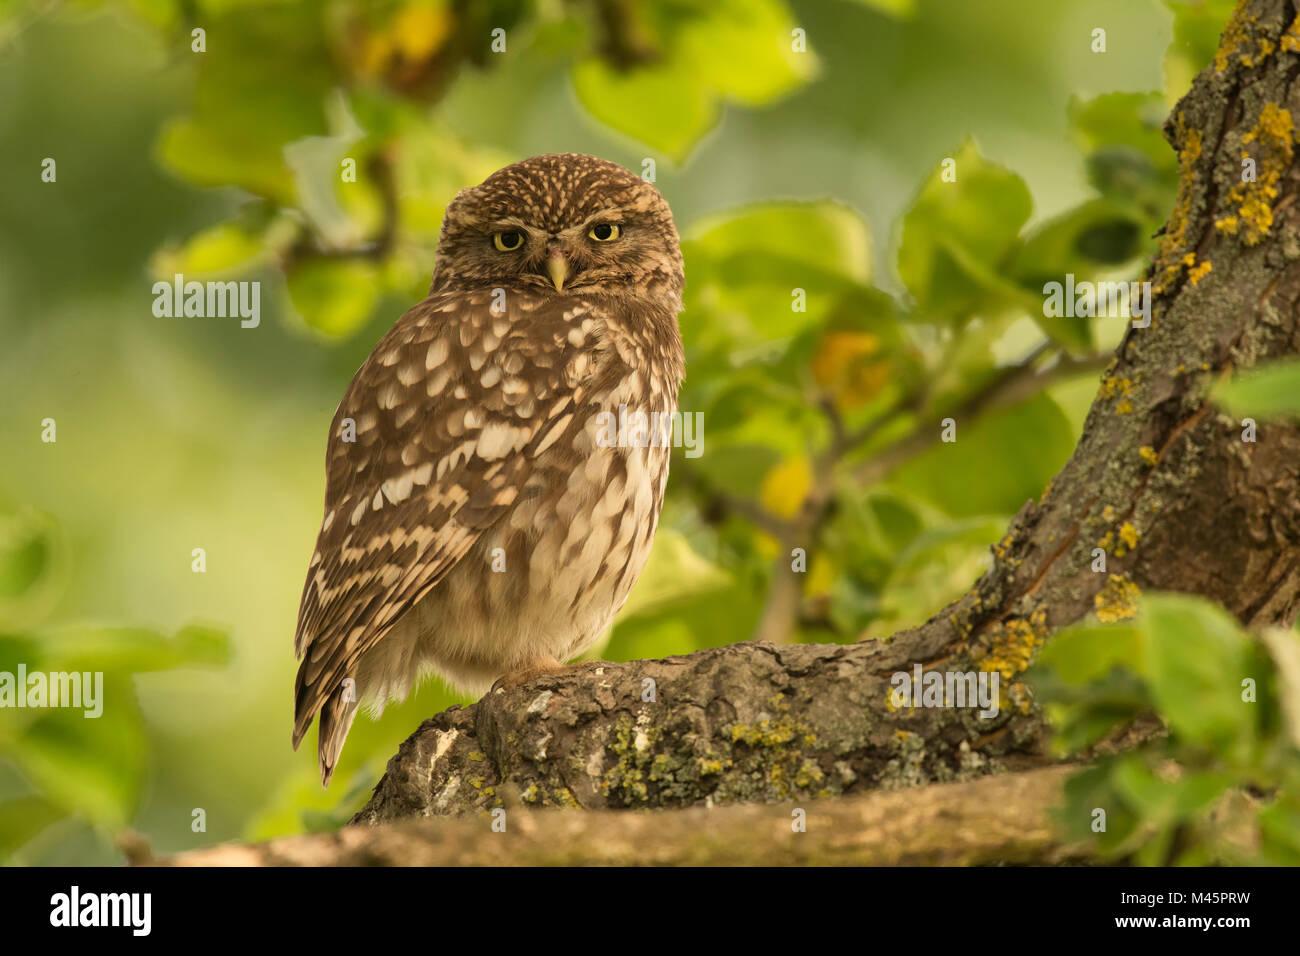 Little owl (Athene noctua) sitting in a tree,direct look,Rhineland-Palatinate,Germany - Stock Image